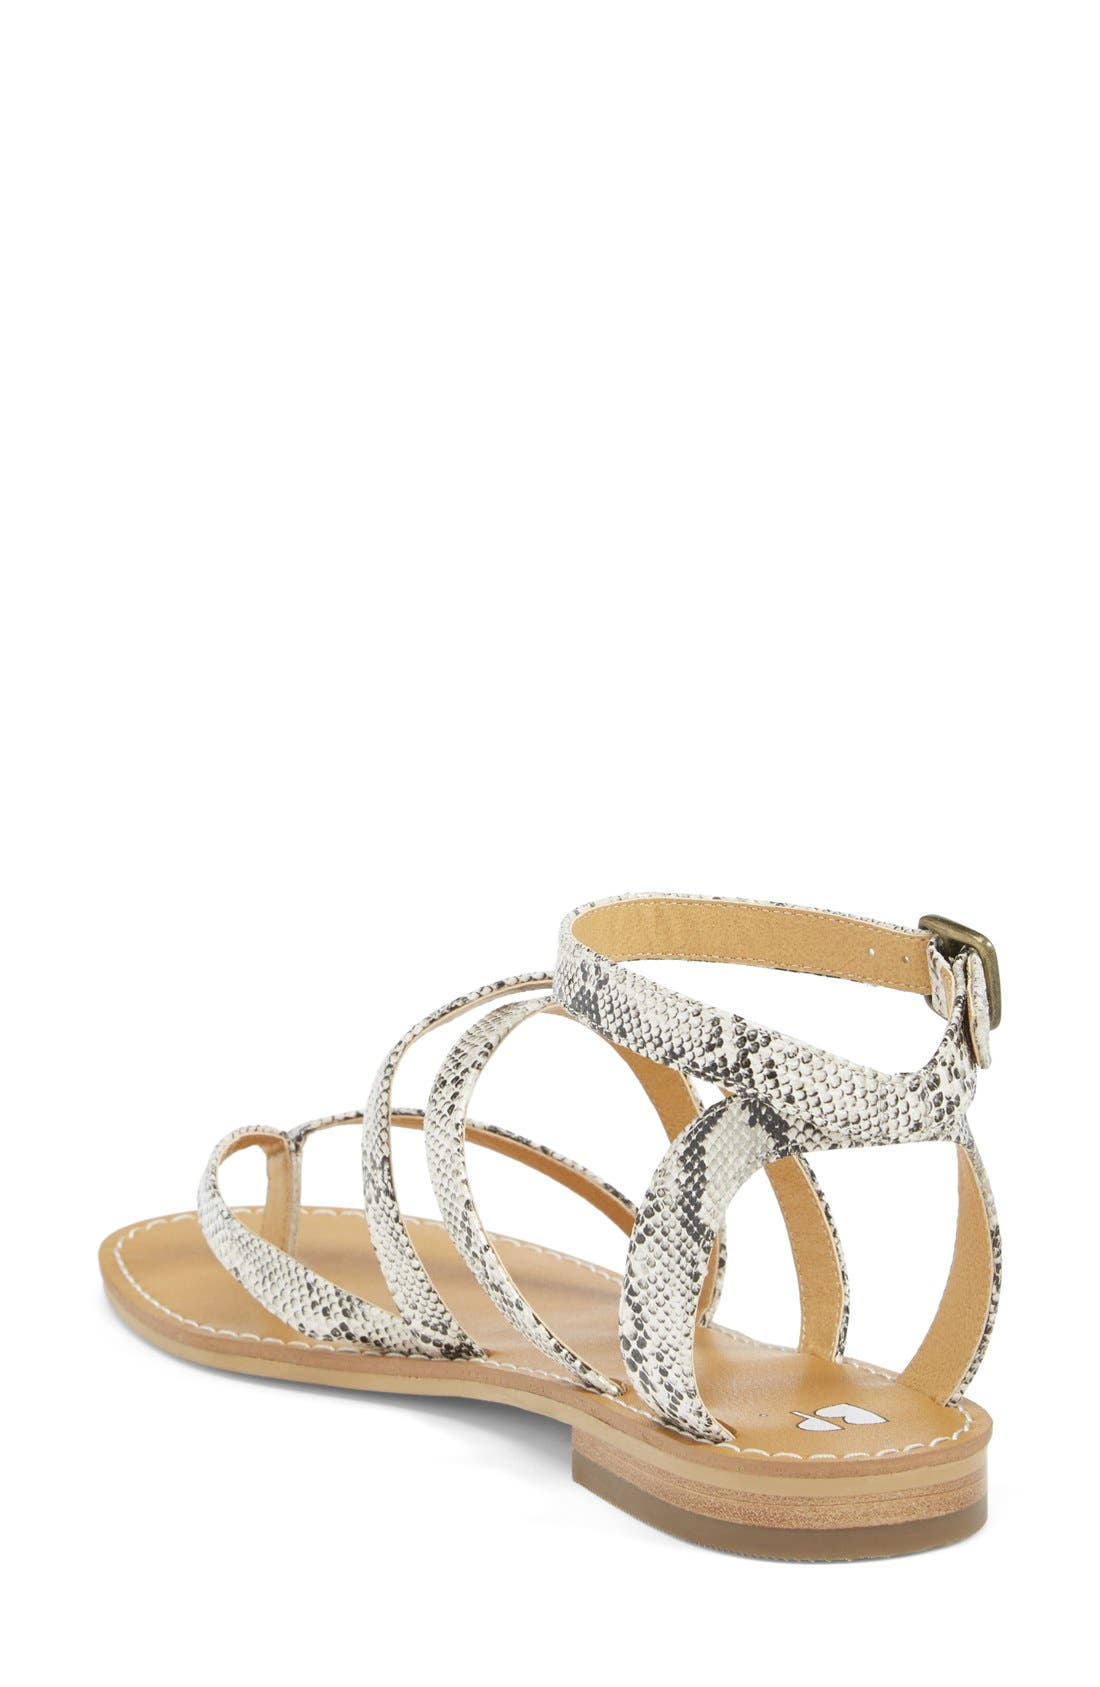 Alternate Image 2  - BP. 'Adriatic' Sandal (Women)